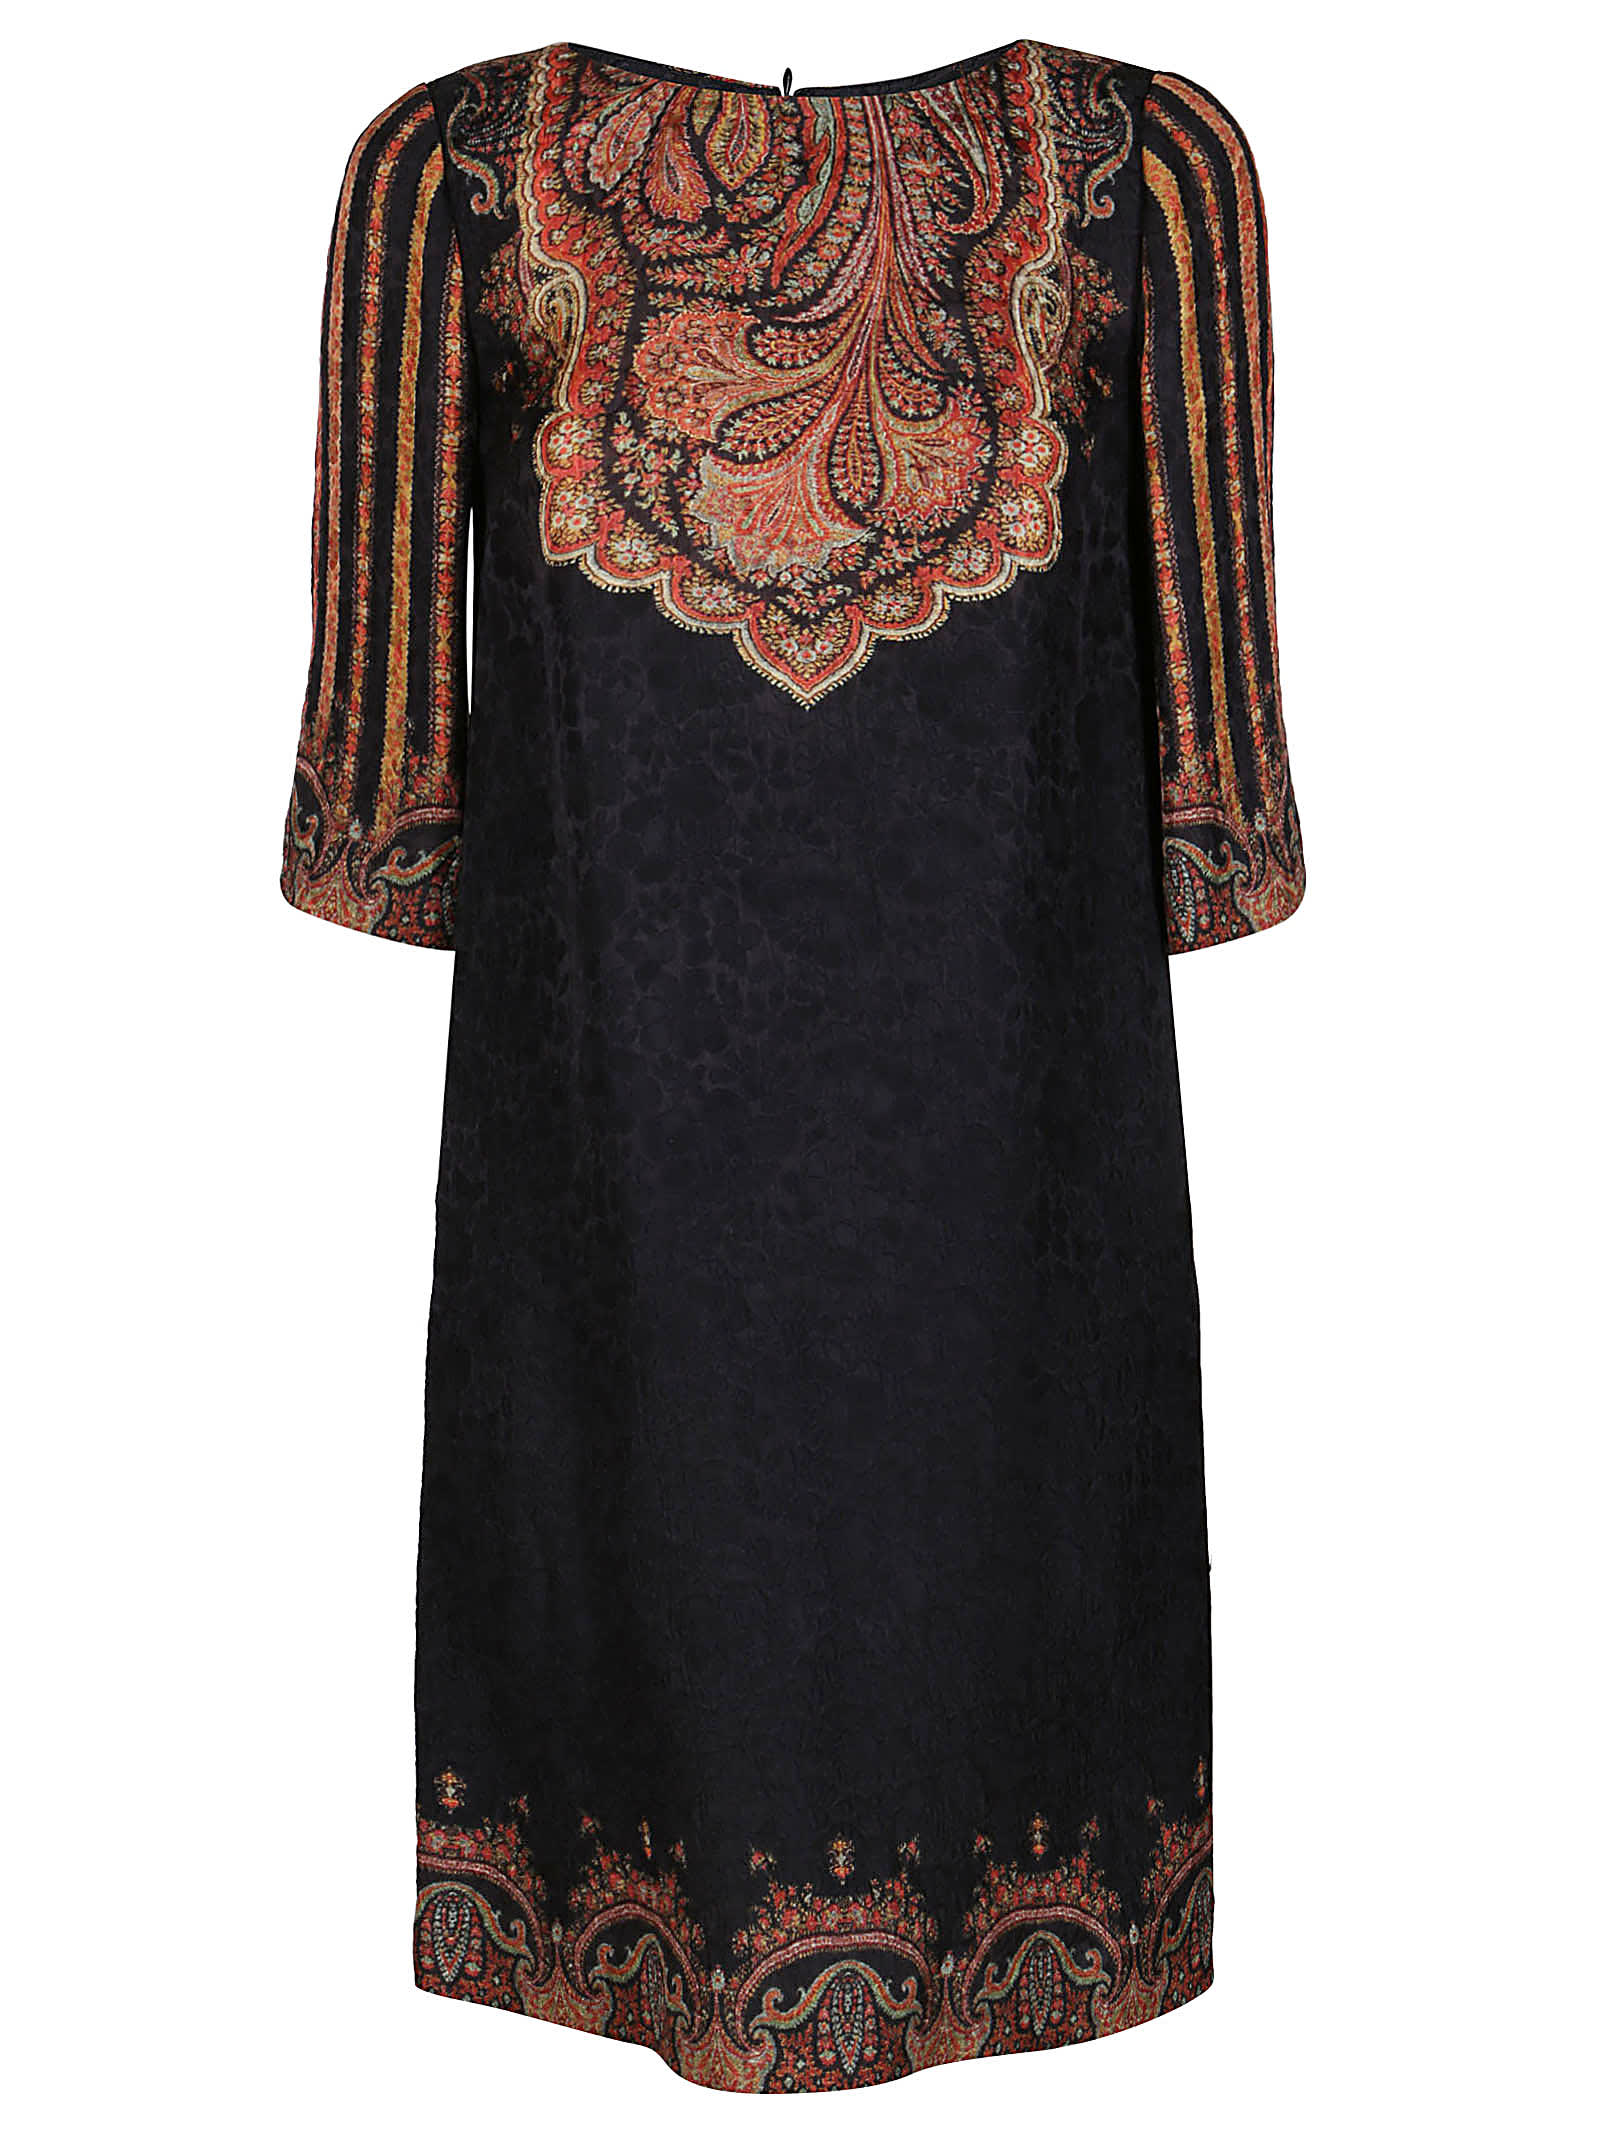 Etro Black Silk-wool-viscose Blend Dress